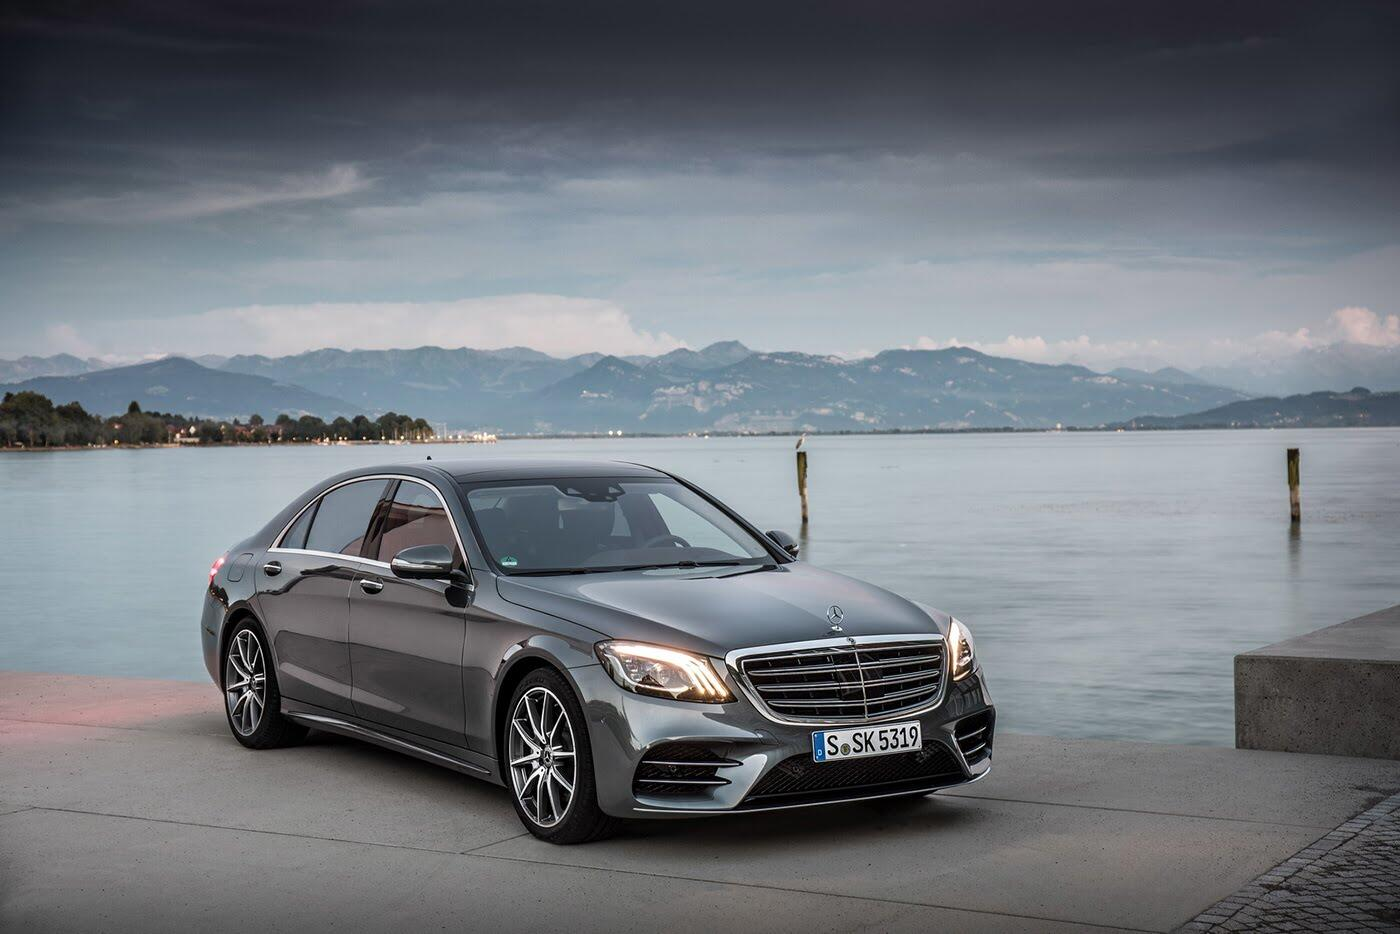 Ảnh chi tiết Mercedes-Benz S-Class 2018 - Hình 28